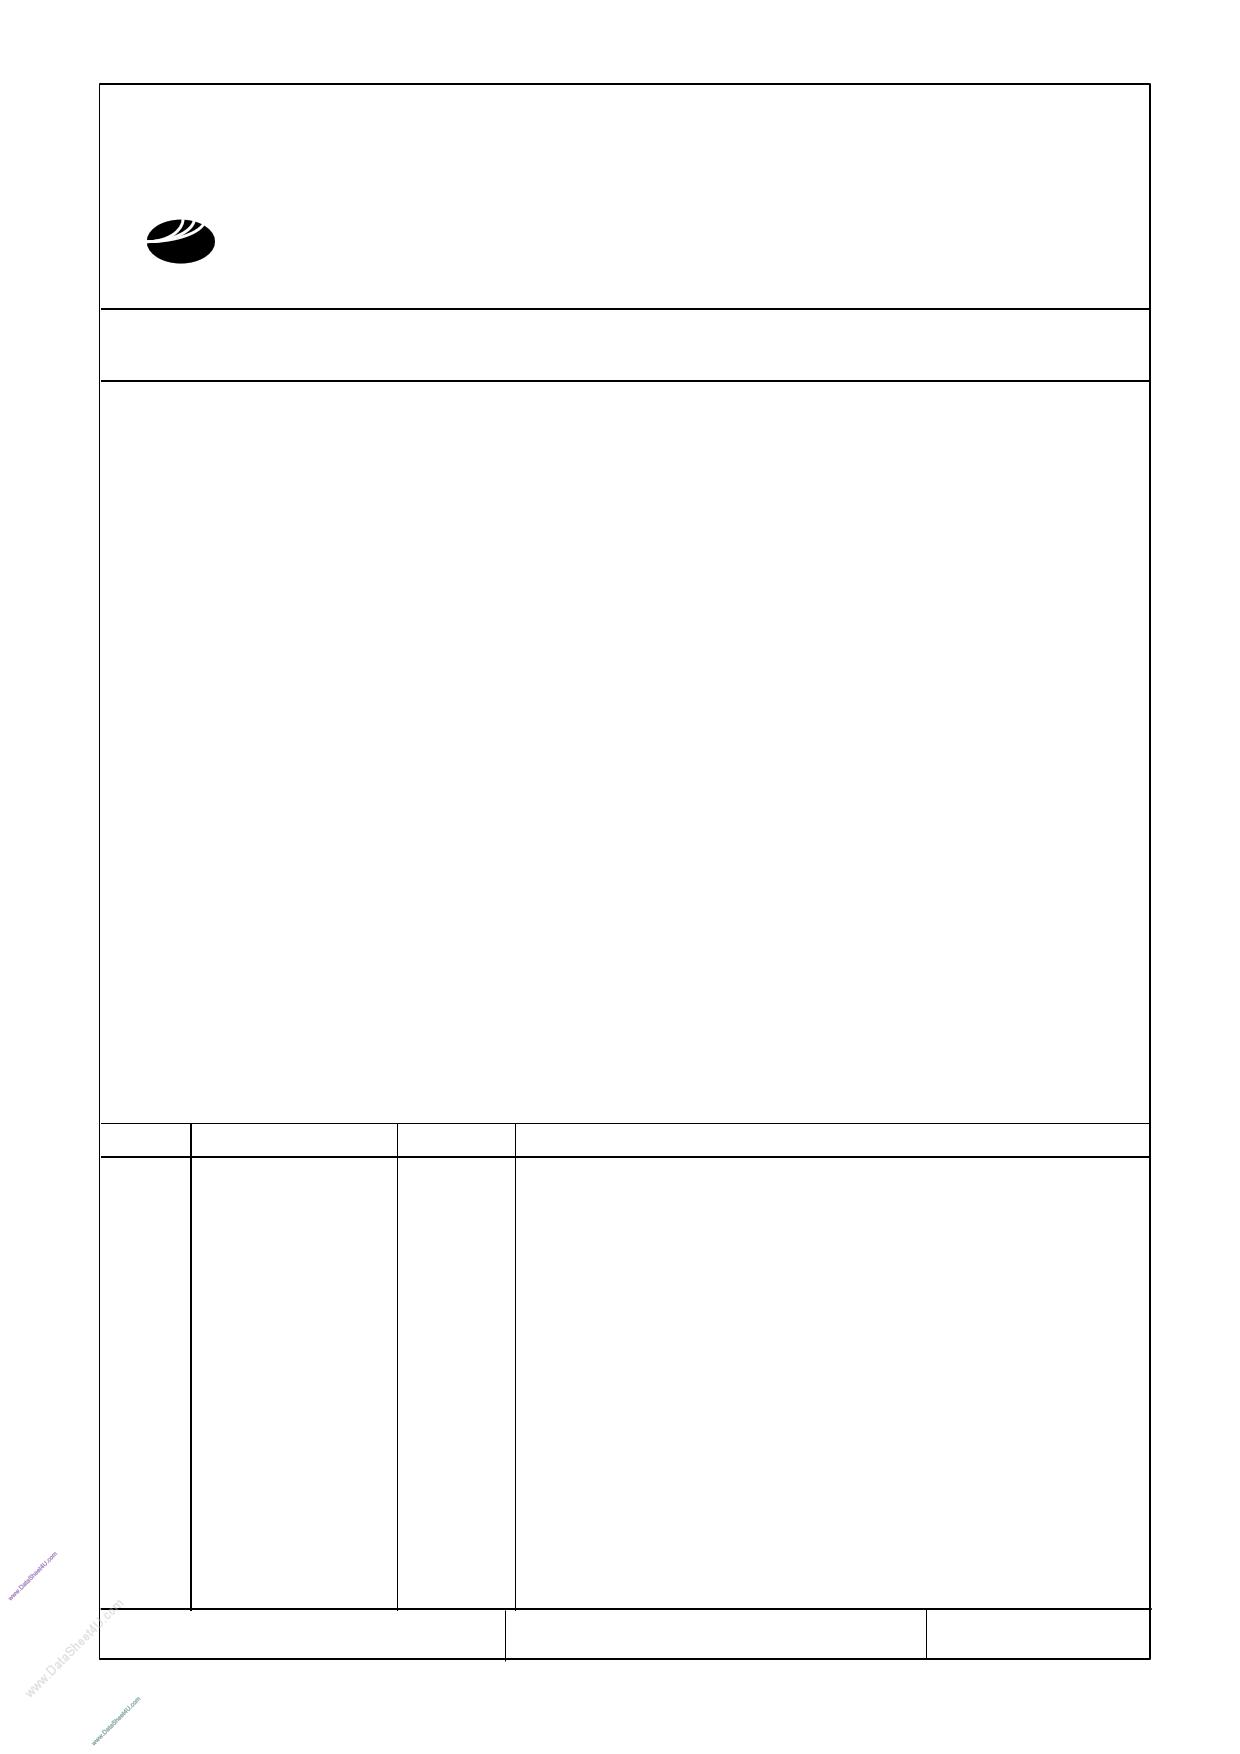 T-51512D121F-FW_A_AA دیتاشیت PDF